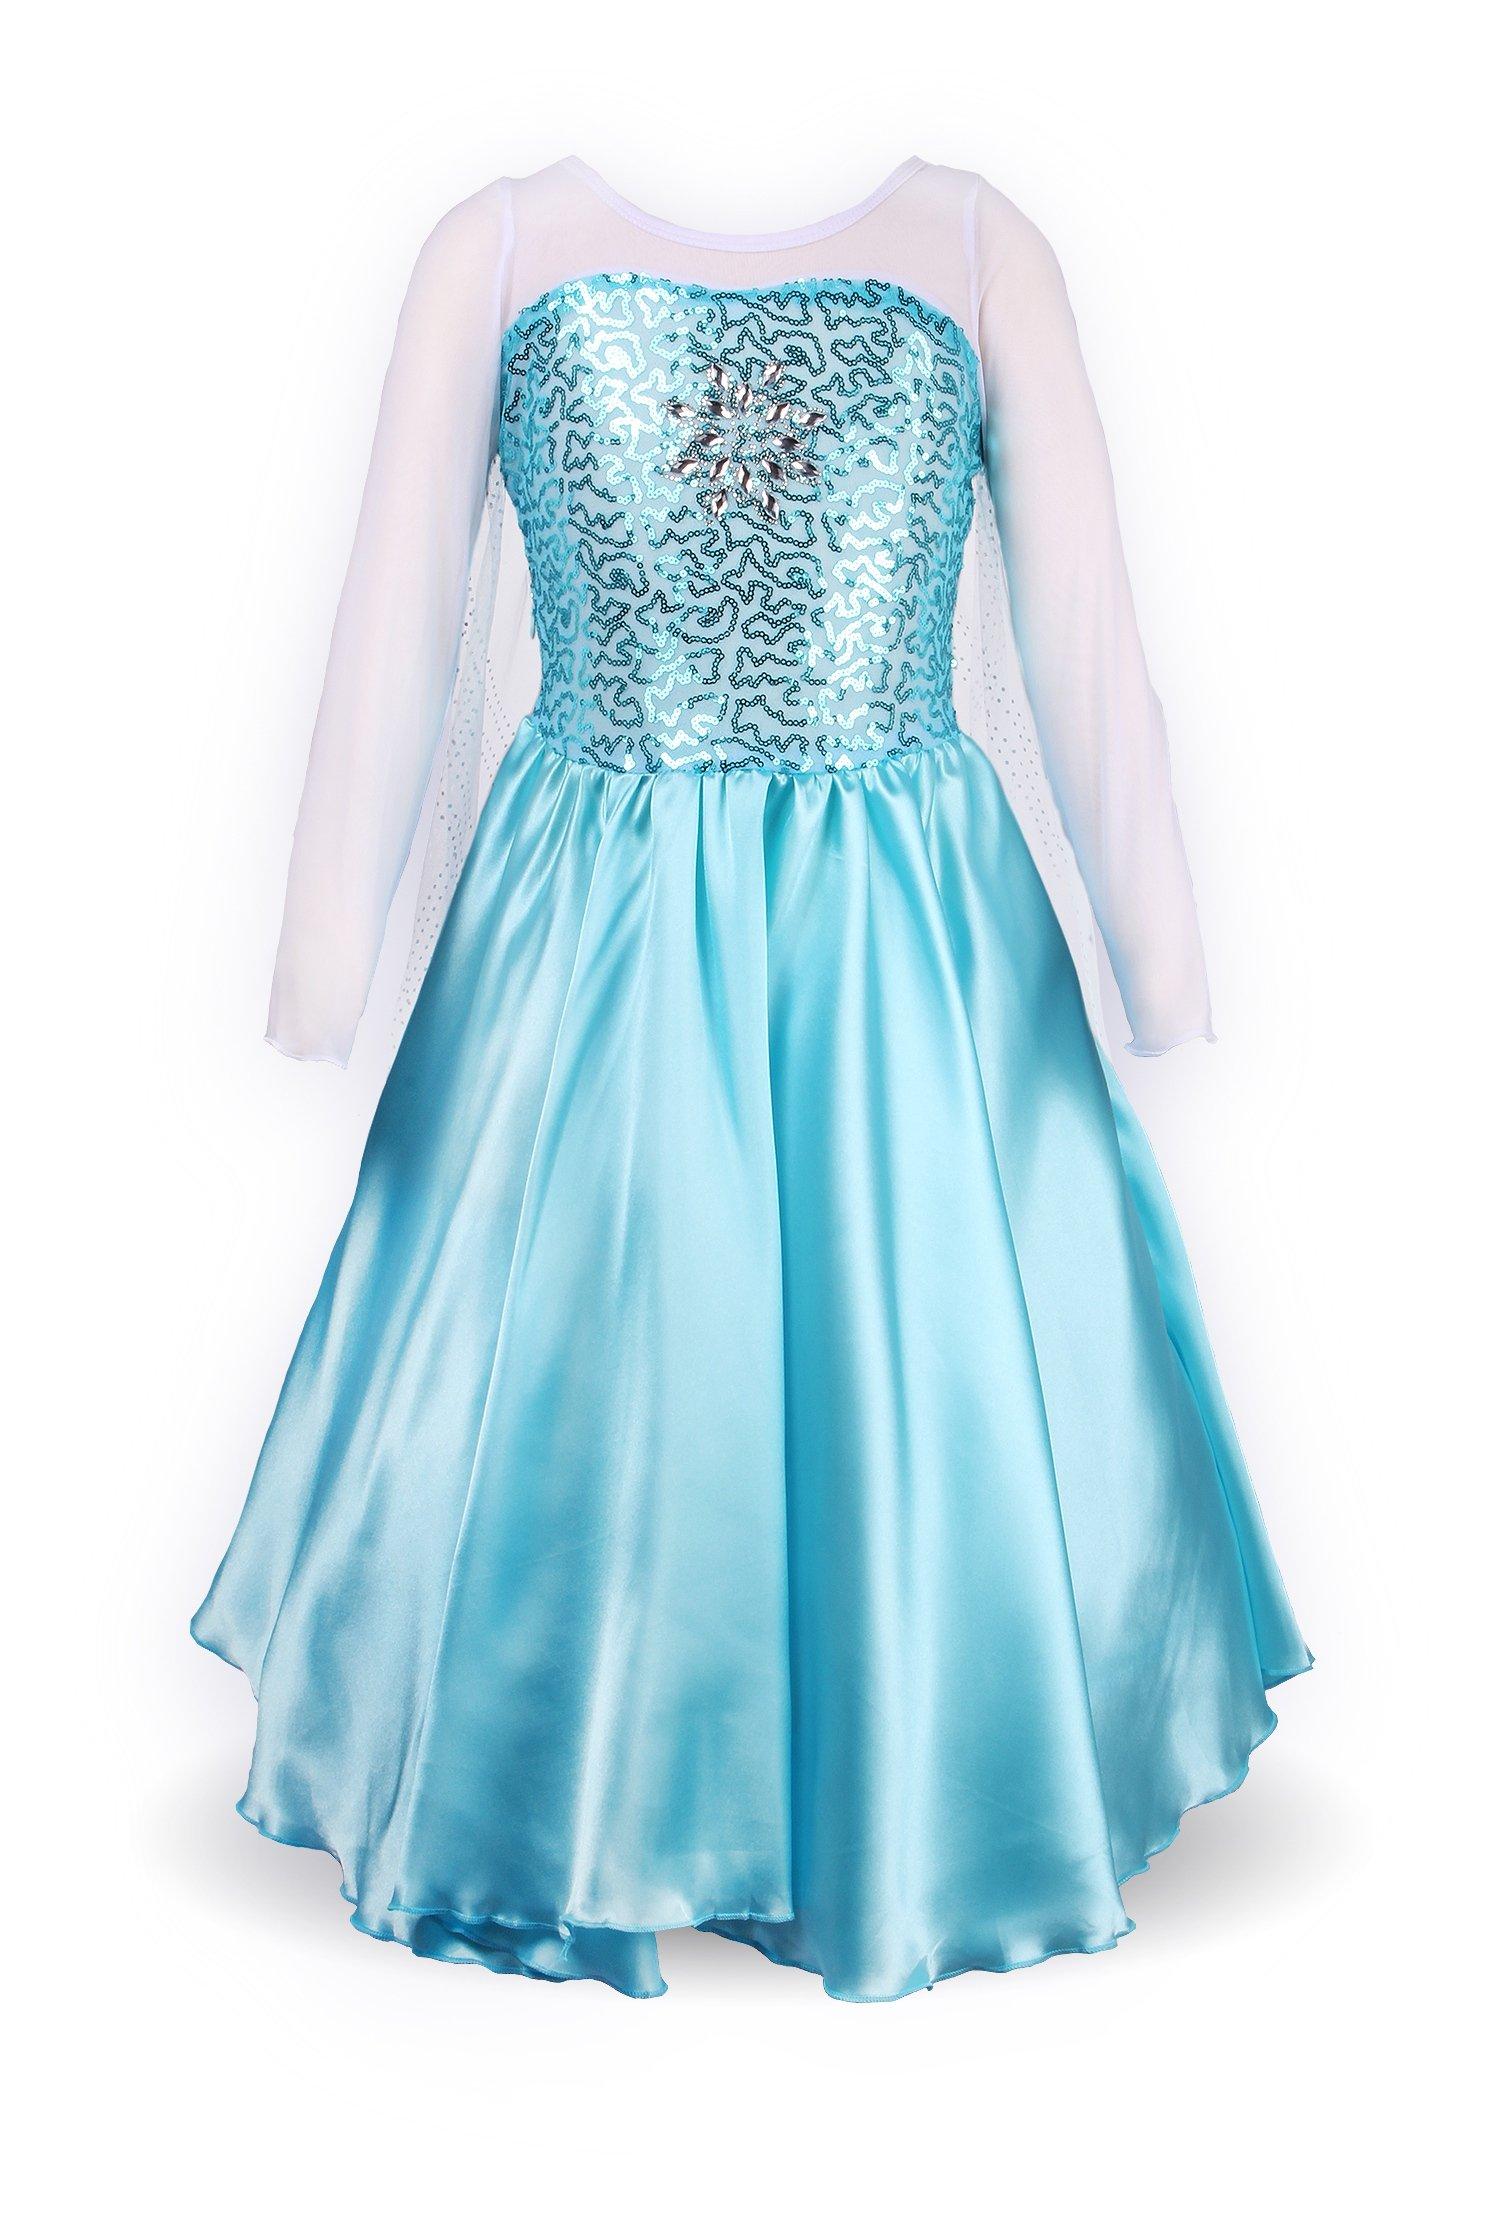 ReliBeauty Little Girl's Princess Fancy Dress Costume, 3T, Sky Blue